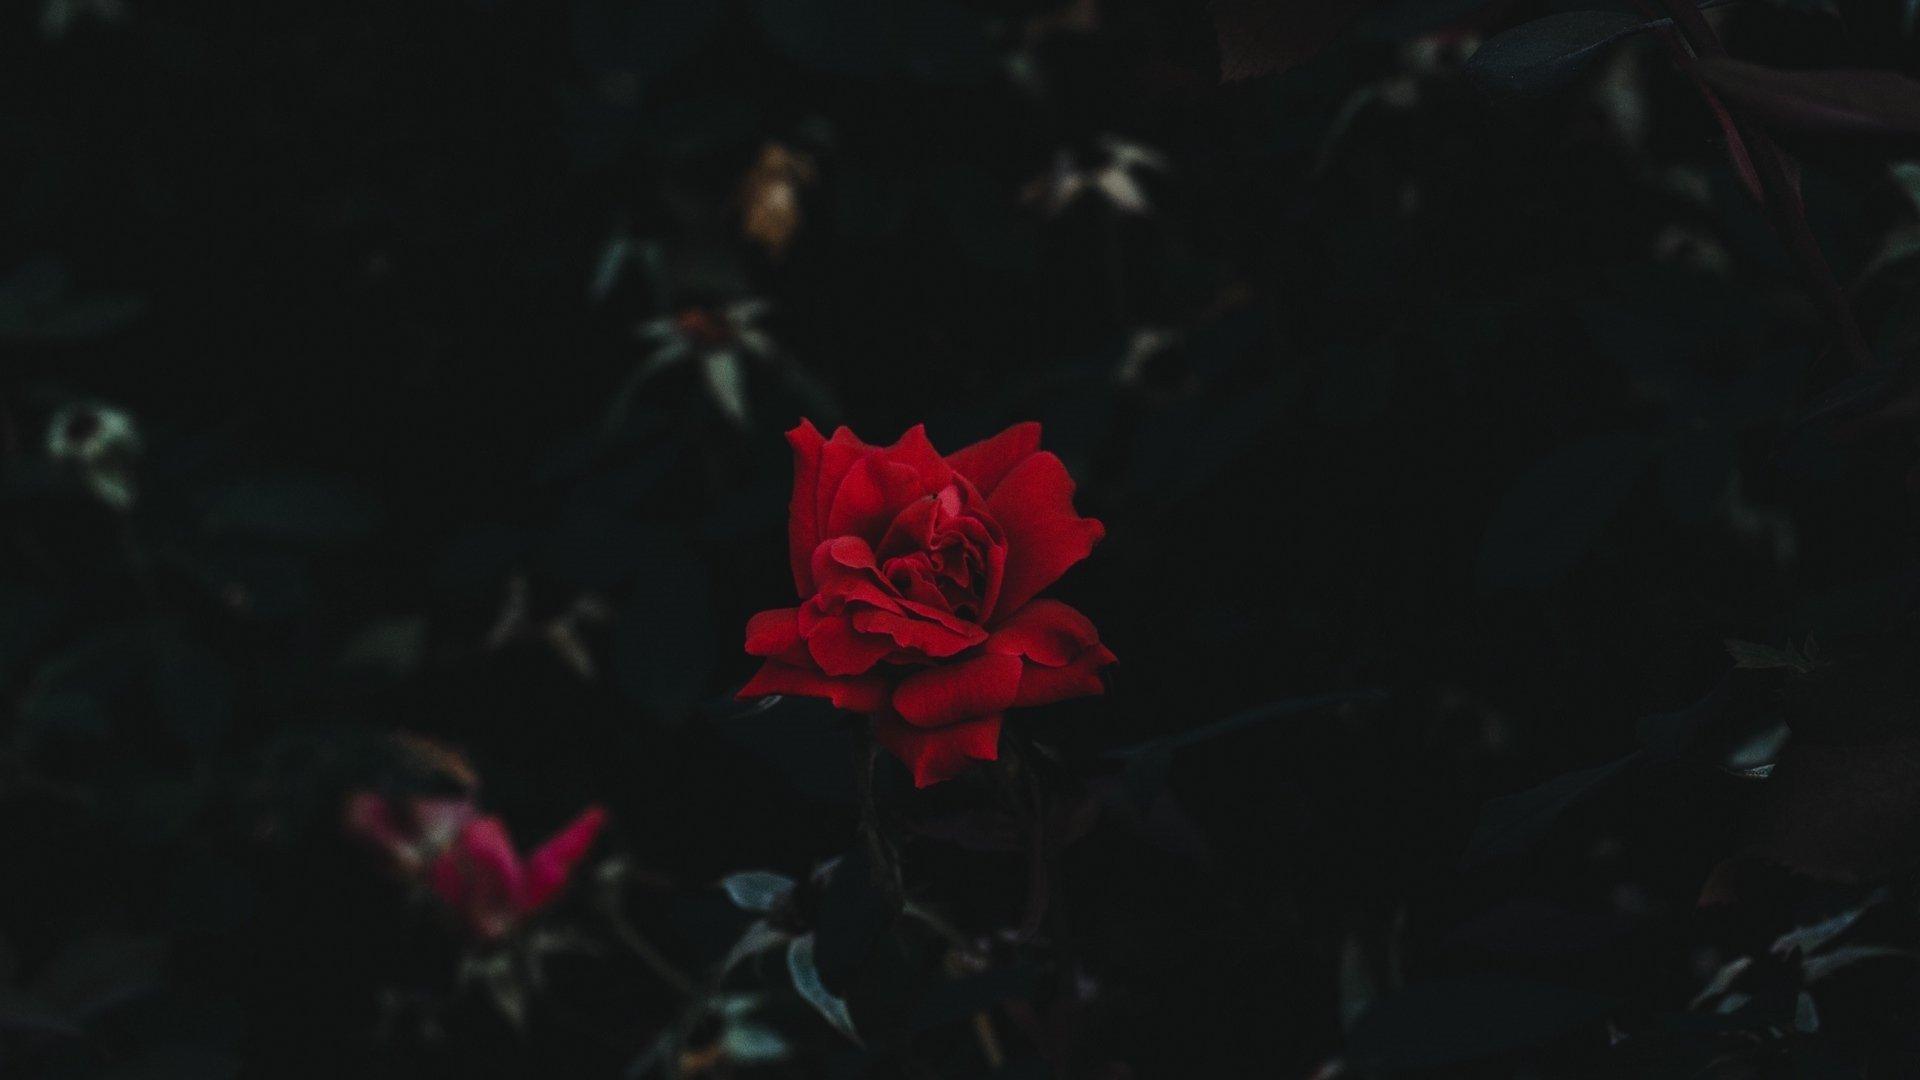 Aesthetic Rose Wallpaper Full HD